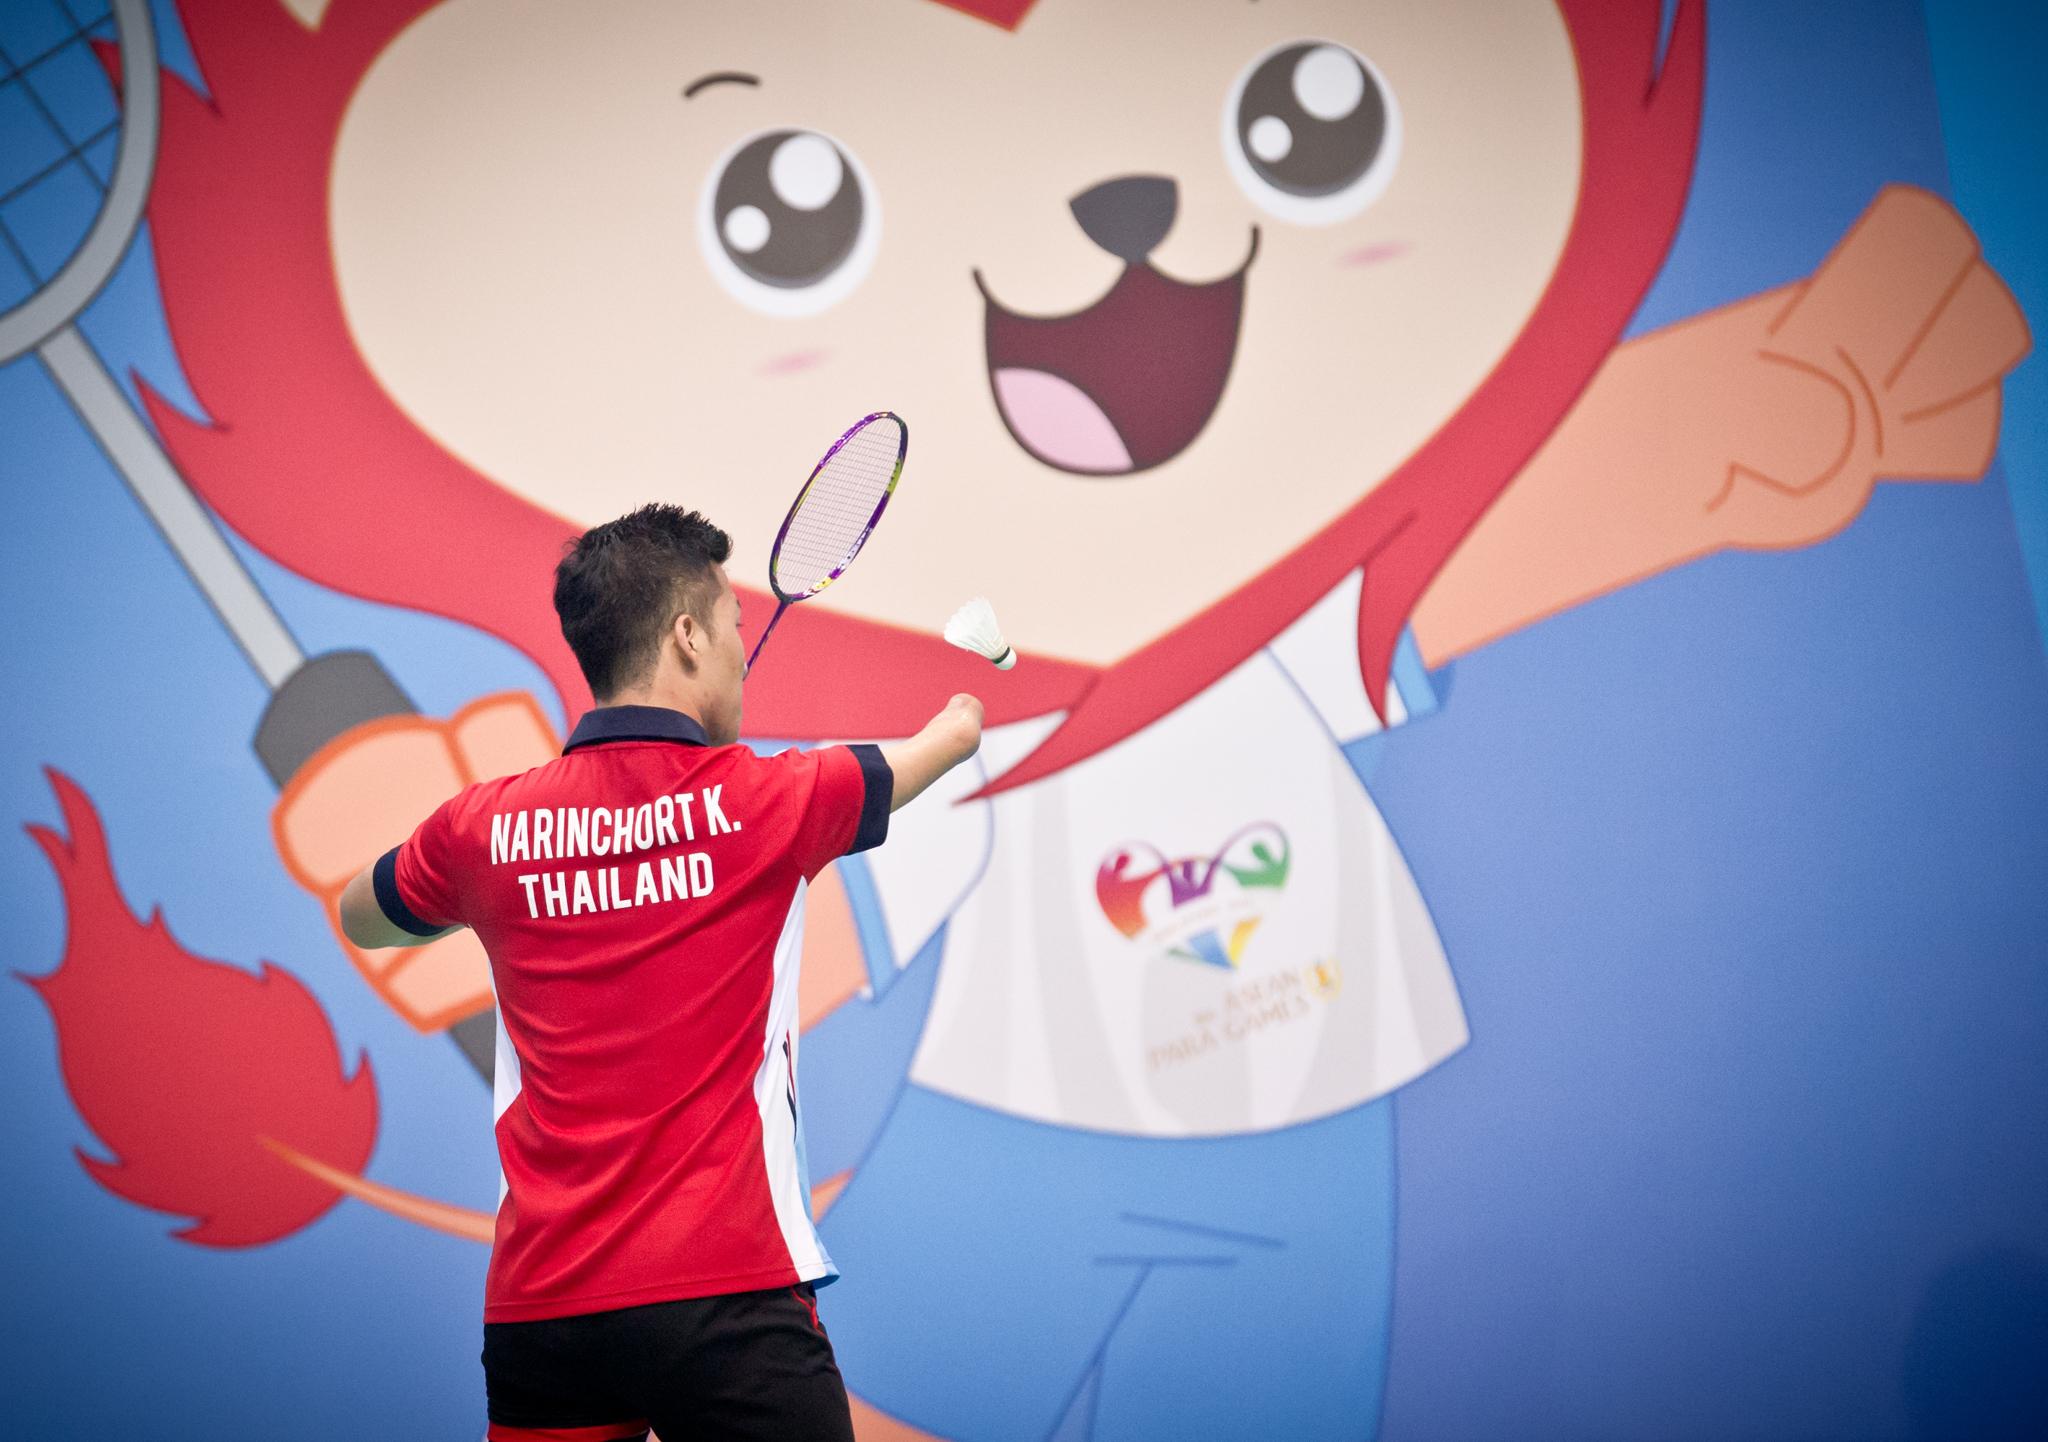 A Thai para-badminton player serves during the ASEAN Para Games at the OCBC Arena.